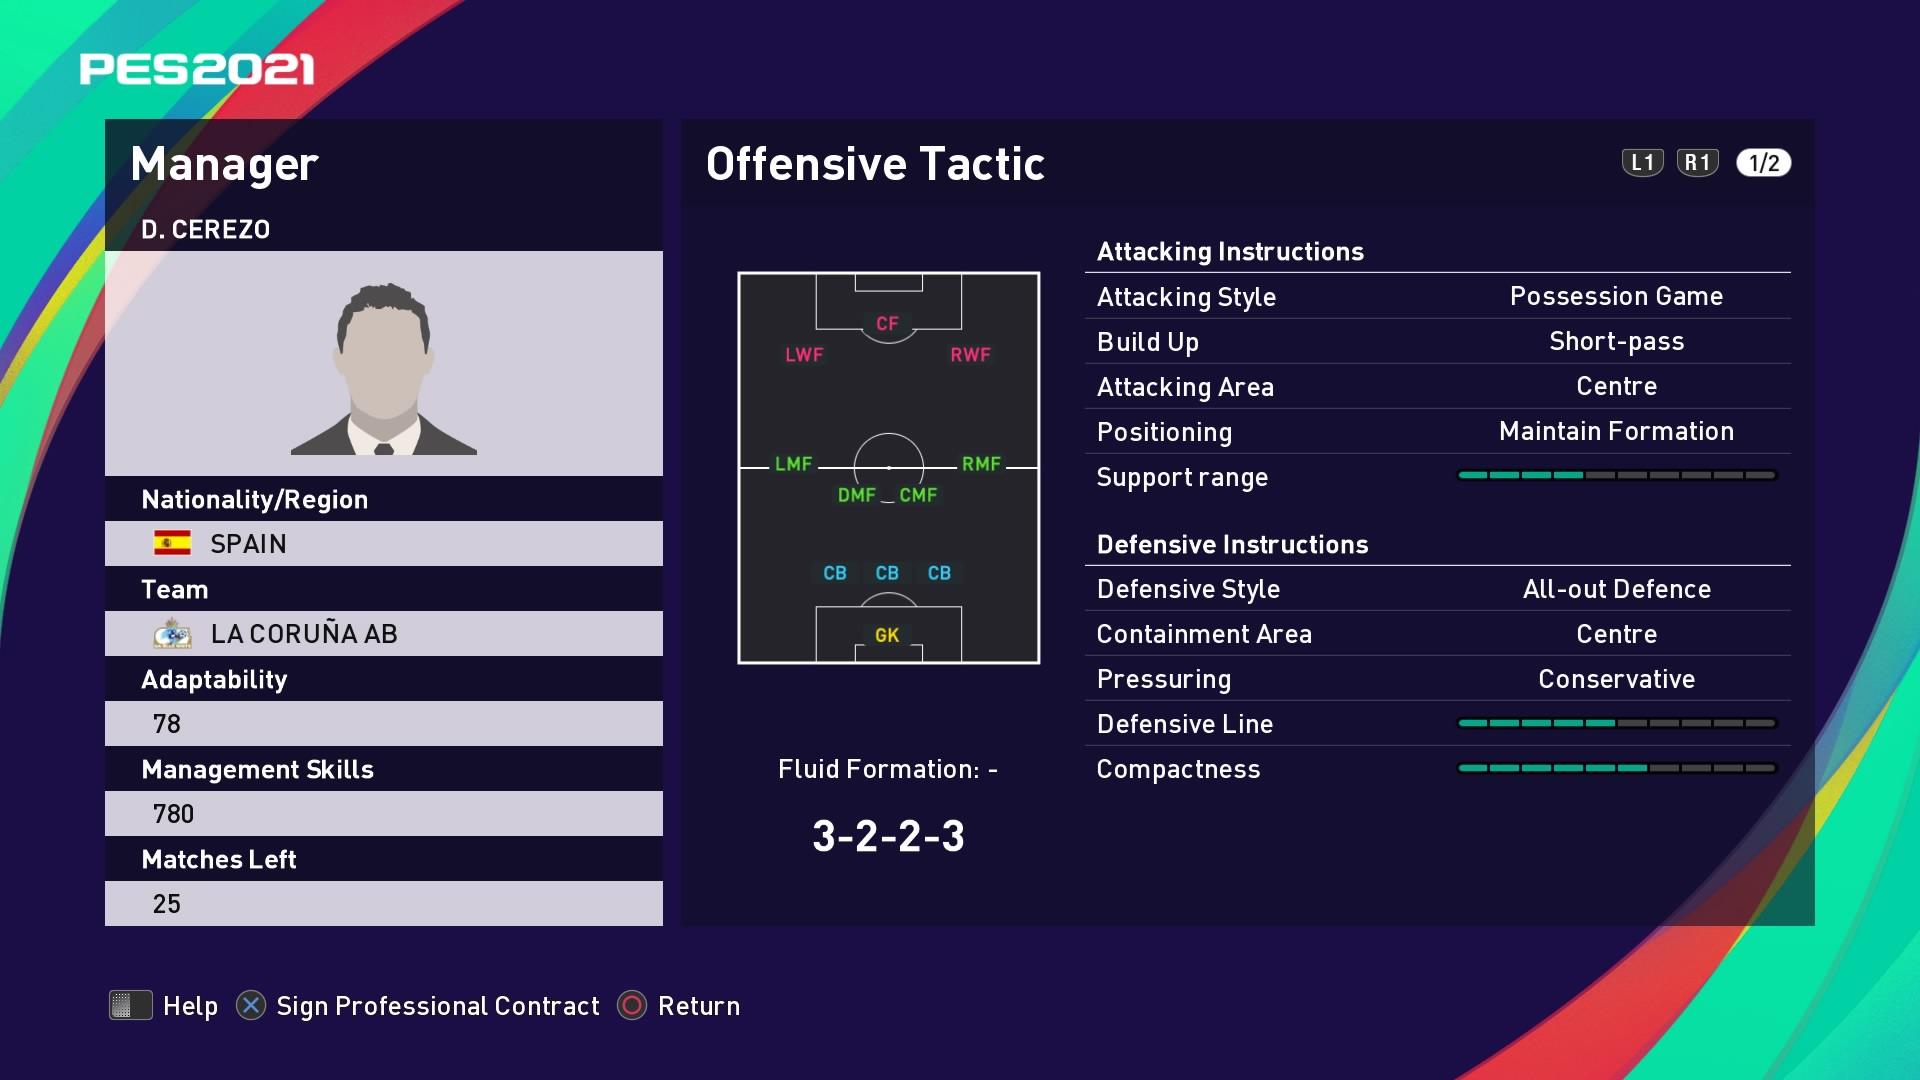 D. Cerezo (Fernando Vázquez) Offensive Tactic in PES 2021 myClub